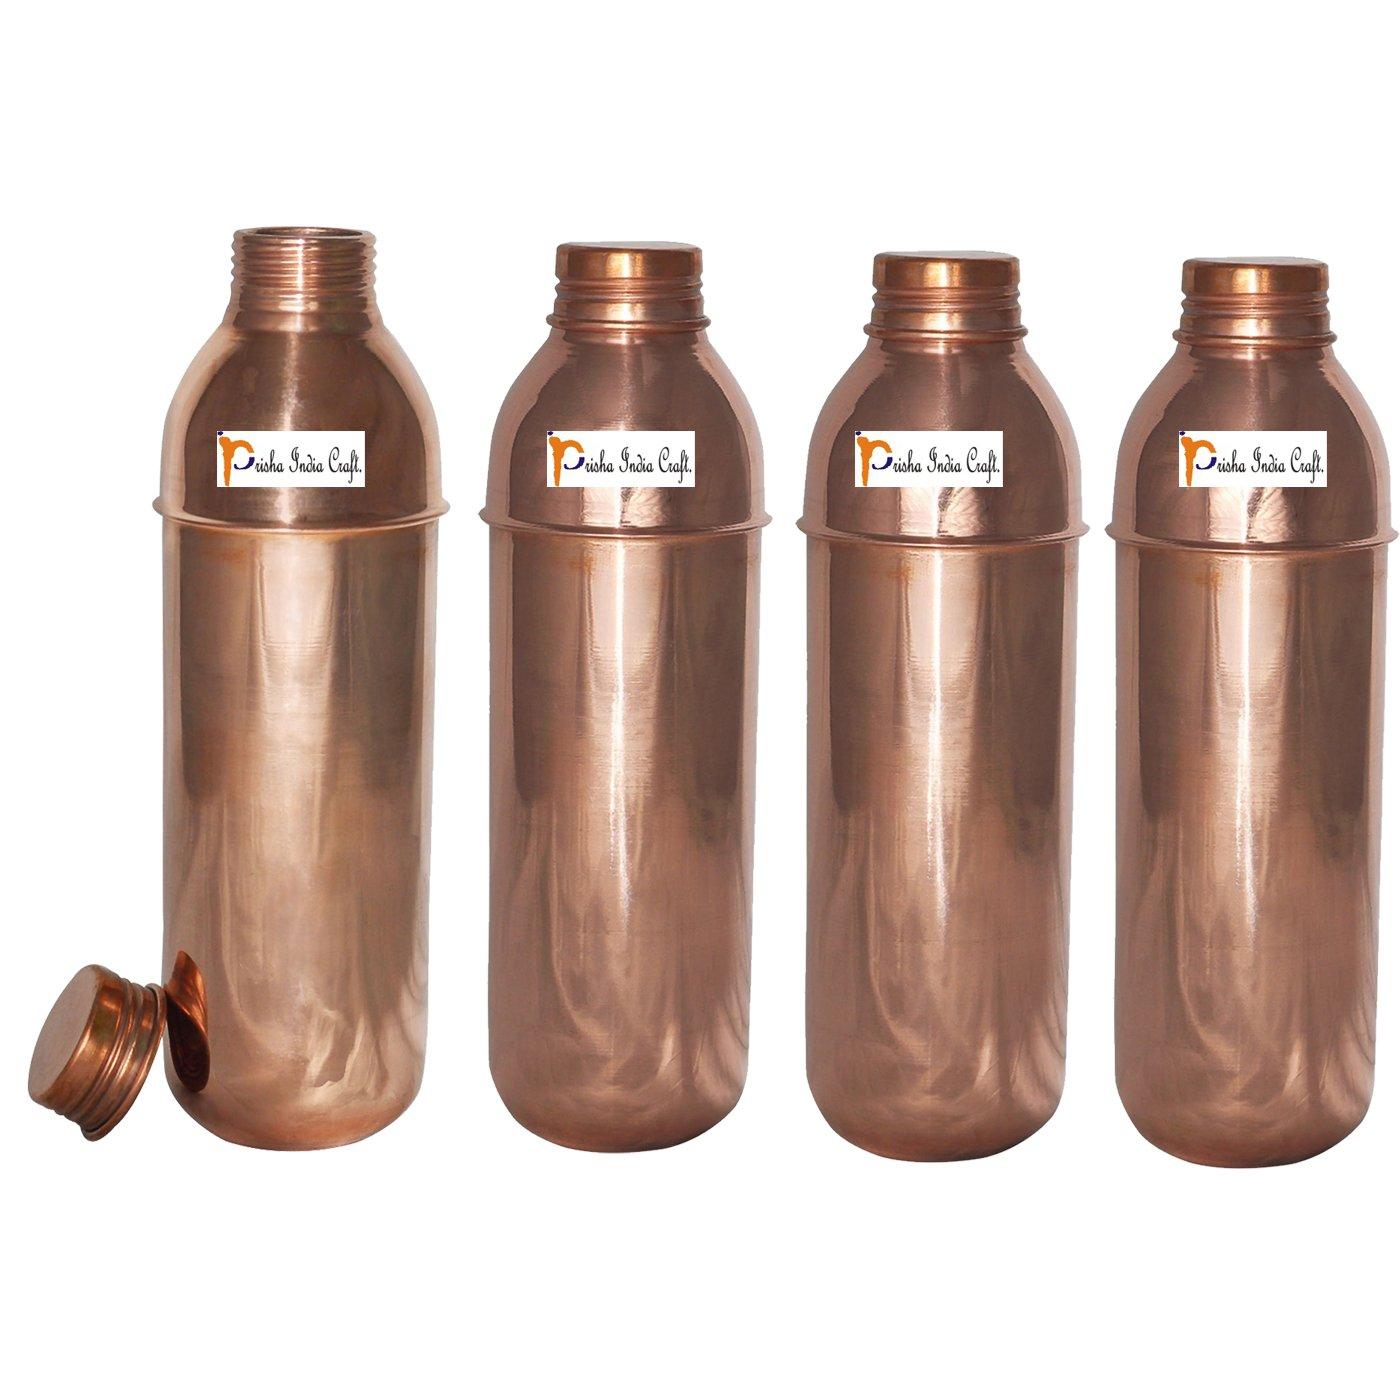 Prisha India Craft (Set of 4) Copper New Bislery Stylish Bottle with Ayurvedic benefited - 800 ML / 27 oz Thermos Bottles - 100% Genuine Copper Water Bottles